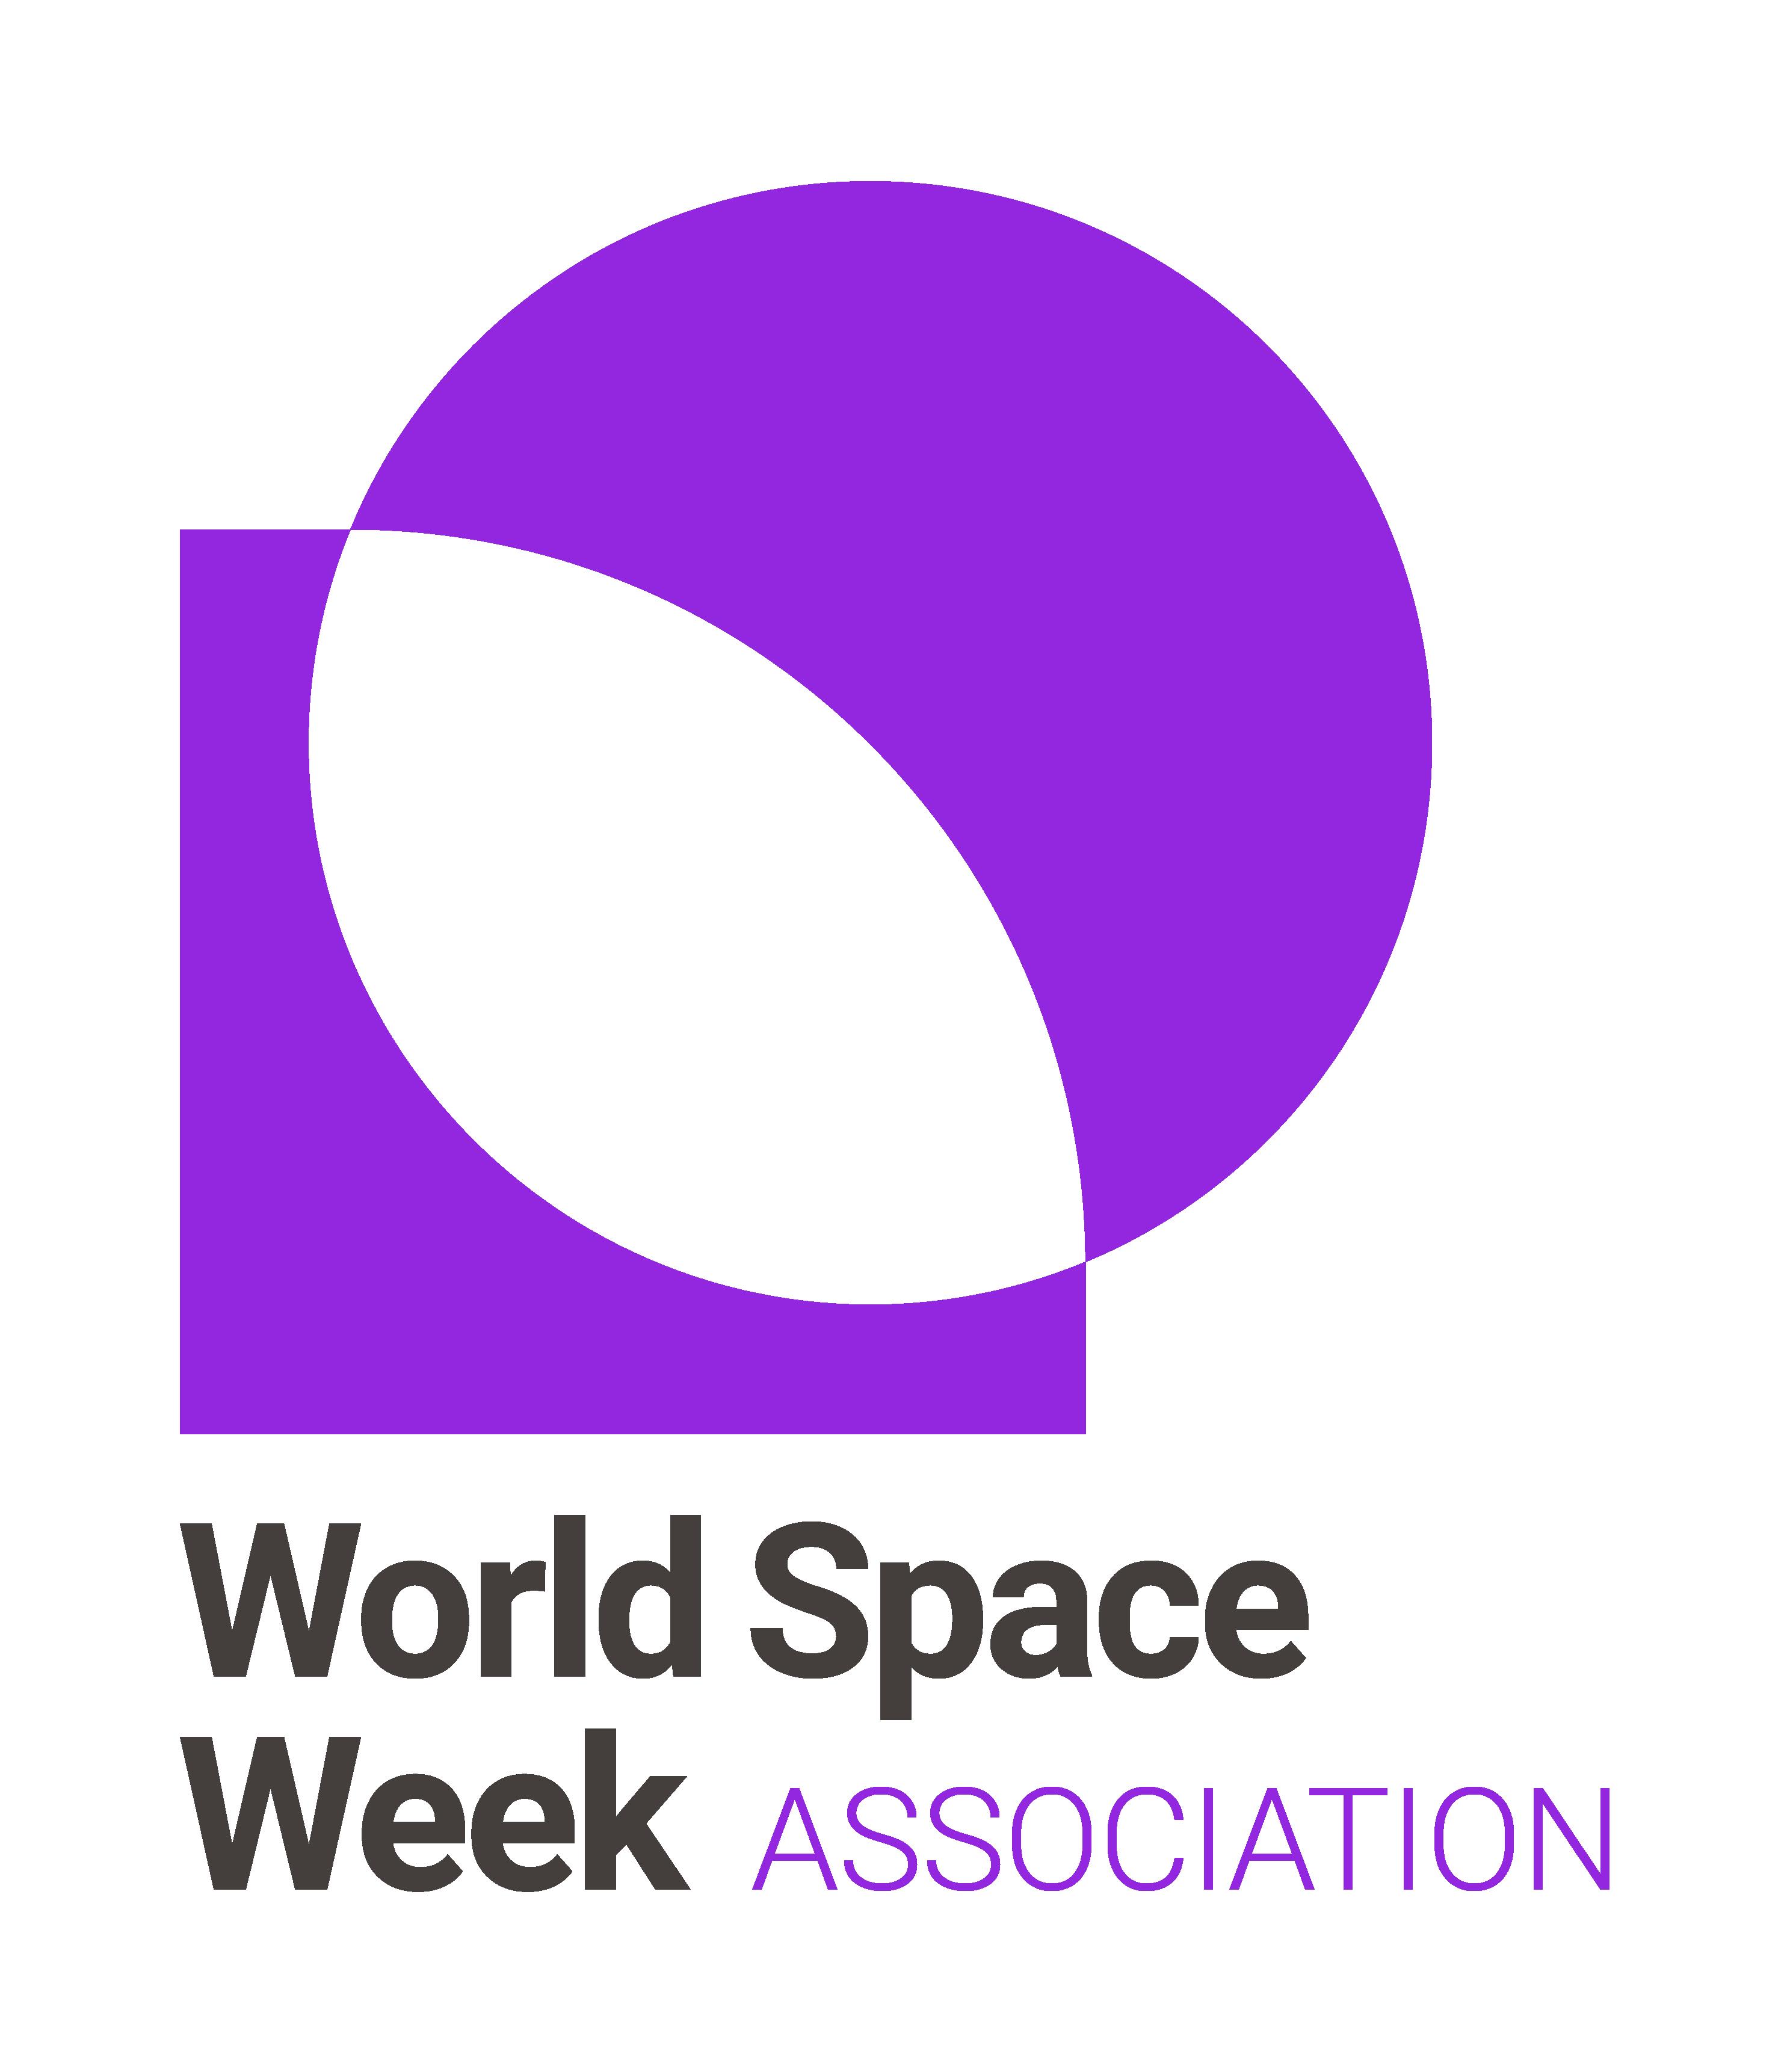 World Space Week Association